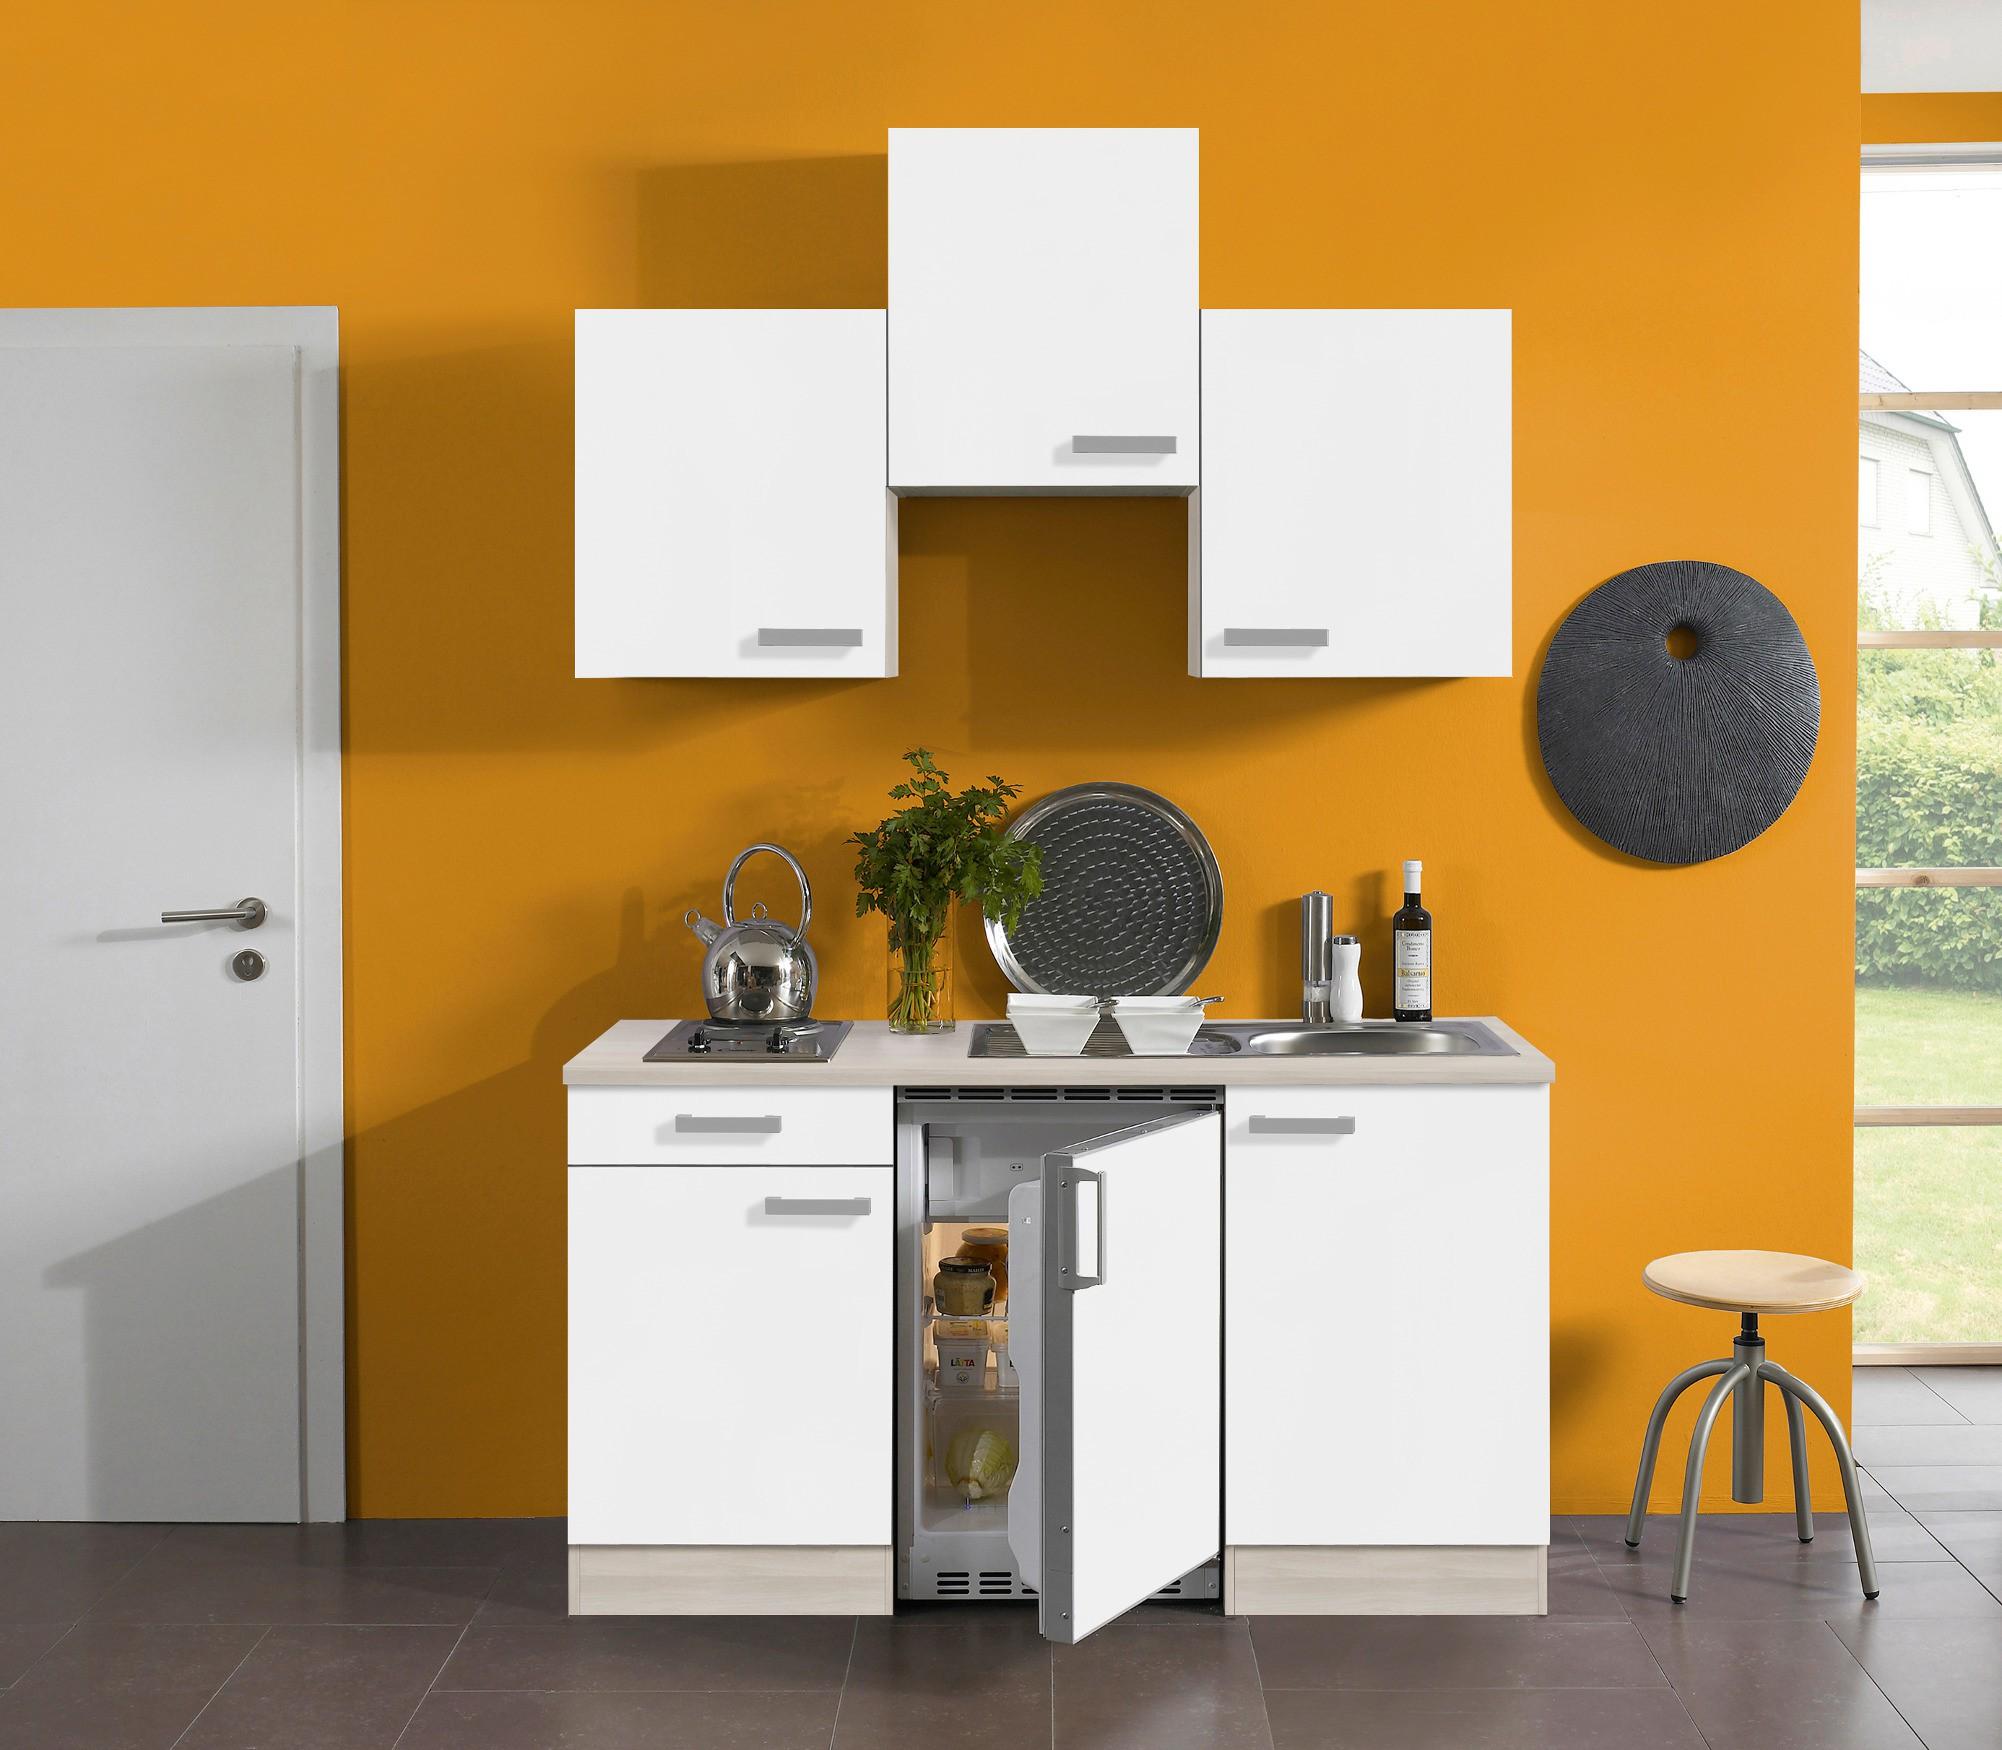 singlek che barcelona vario 1 mit elektro kochfeld breite 150 cm wei k che singlek chen. Black Bedroom Furniture Sets. Home Design Ideas